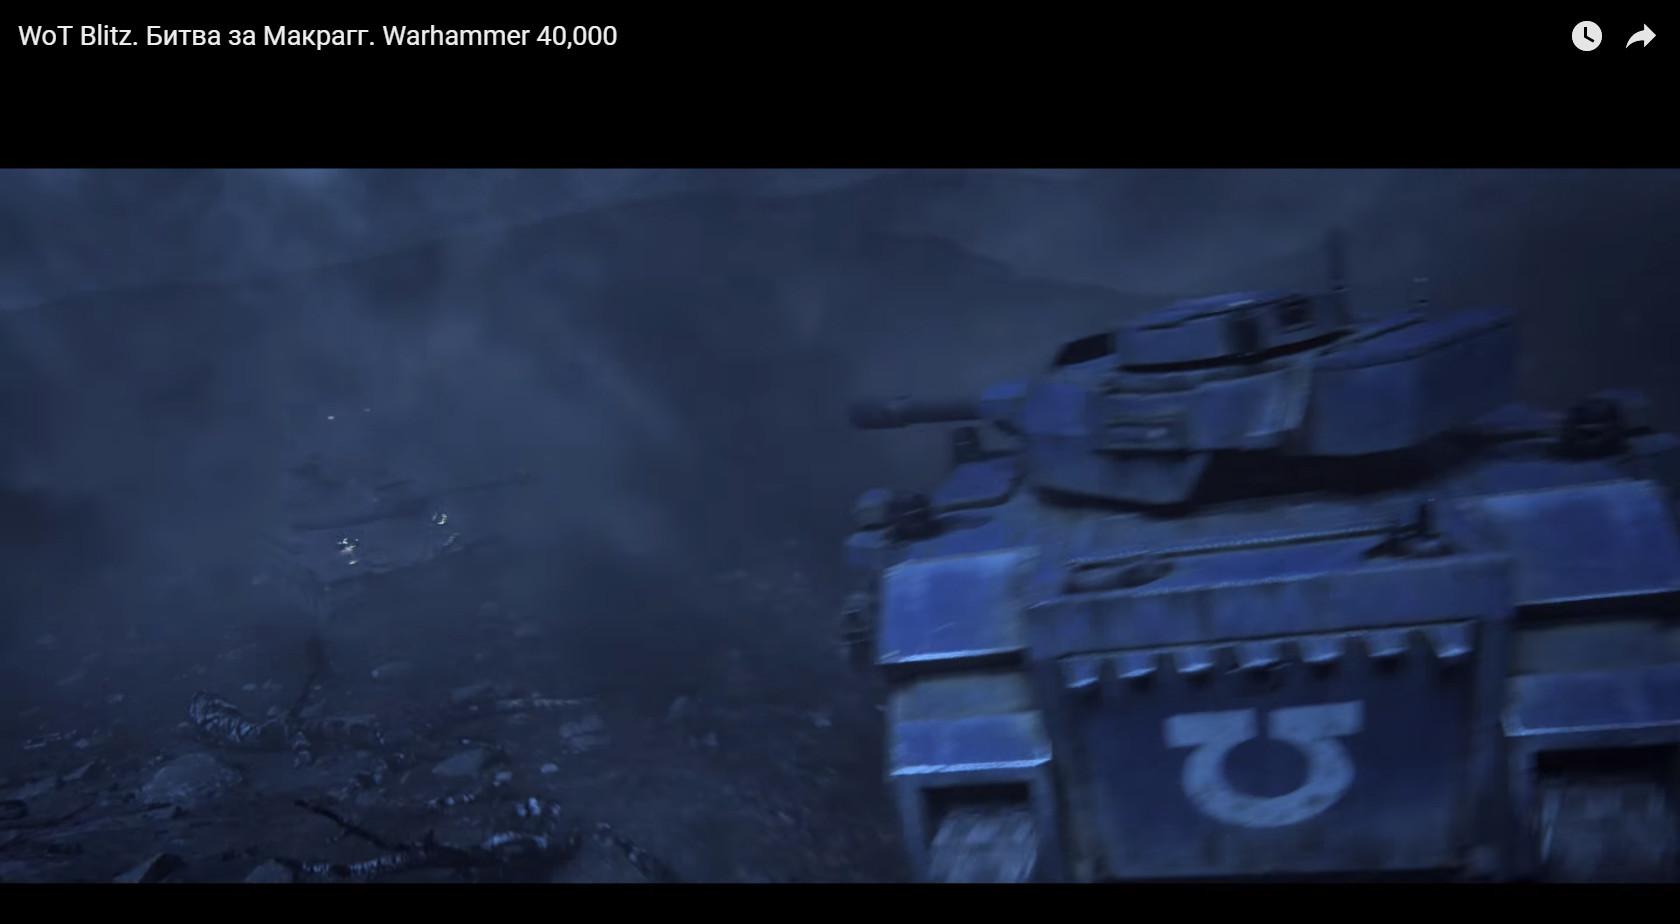 ArtStation - WoT Blitz  WARHAMMER 40,000: MACRAGGE'S THUNDER